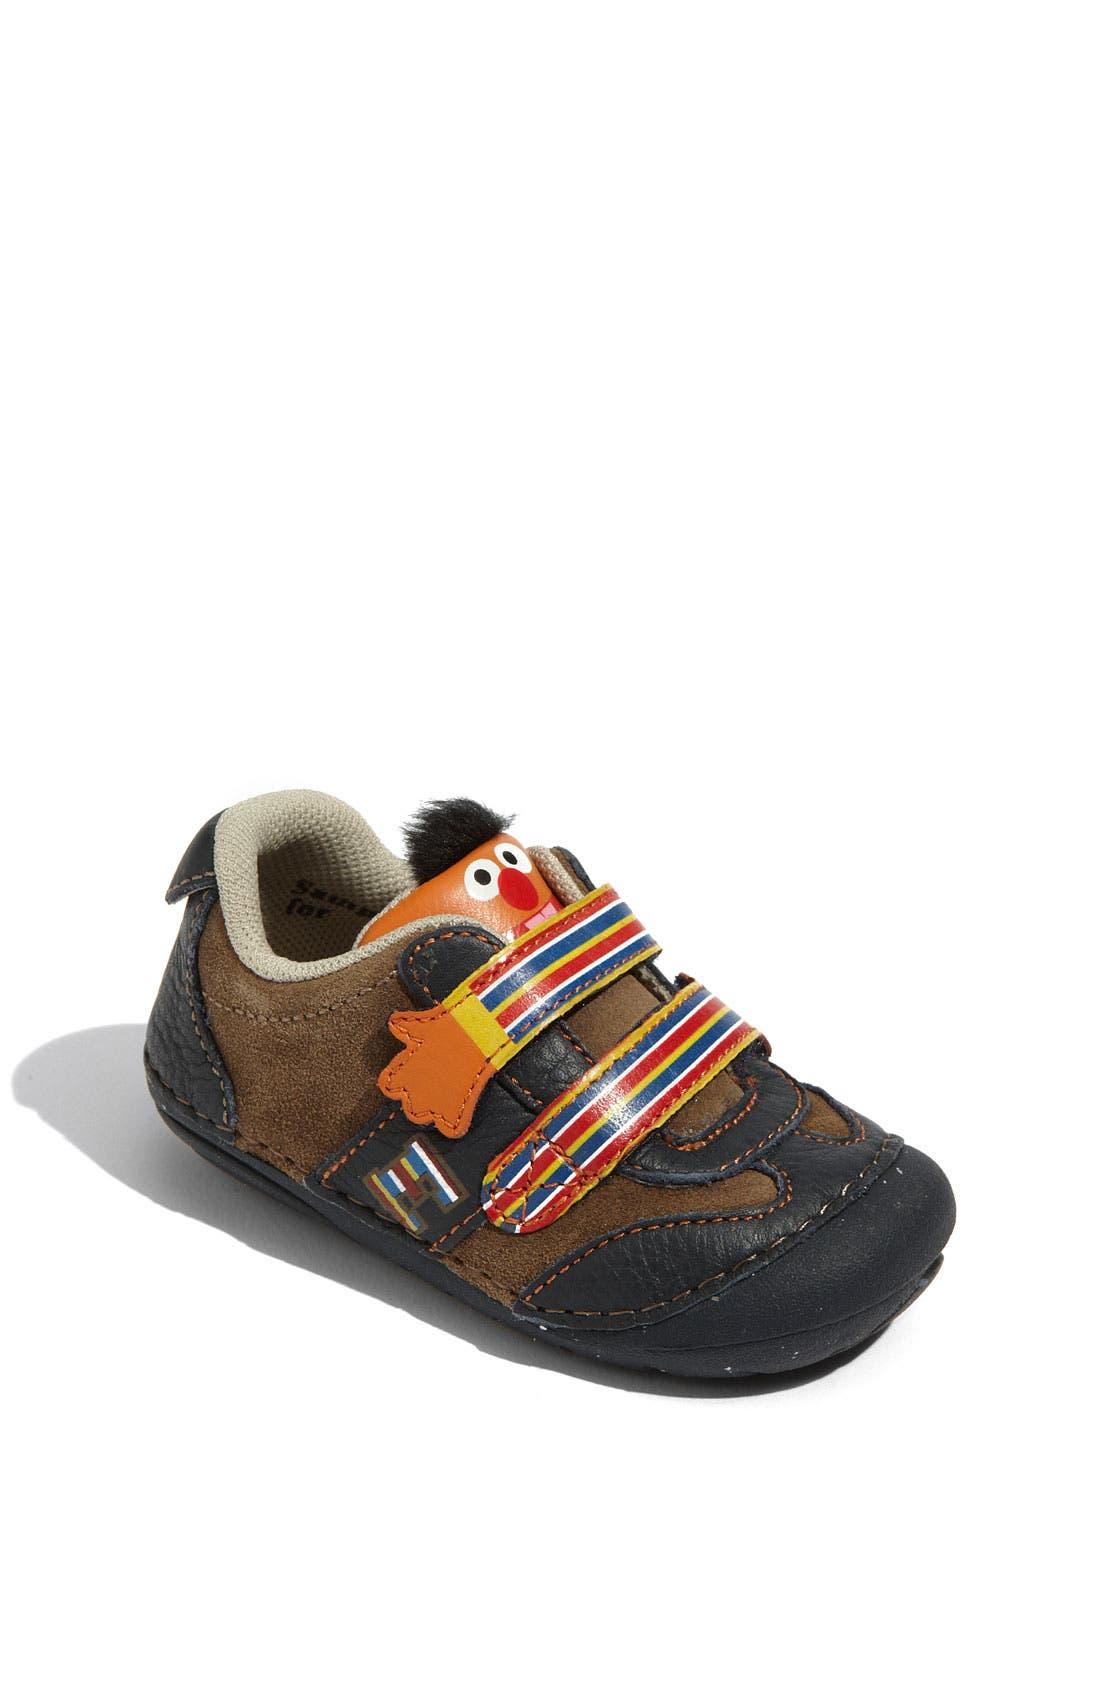 Main Image - Stride Rite 'Sesame Street® - Ernie' Sneaker (Baby & Walker)